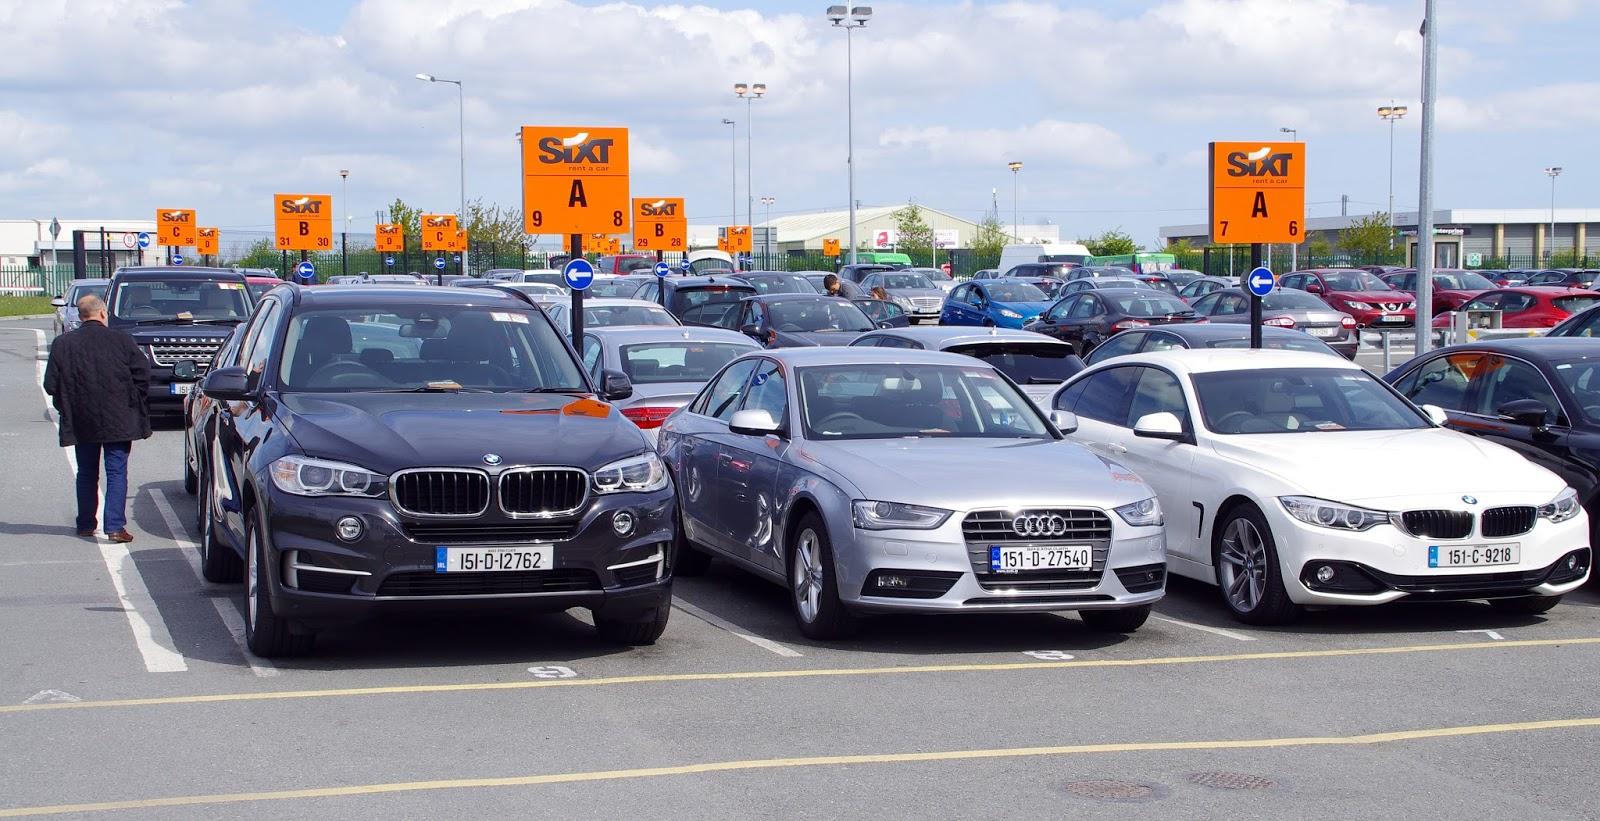 Dublin Airport Car Hire Sixt